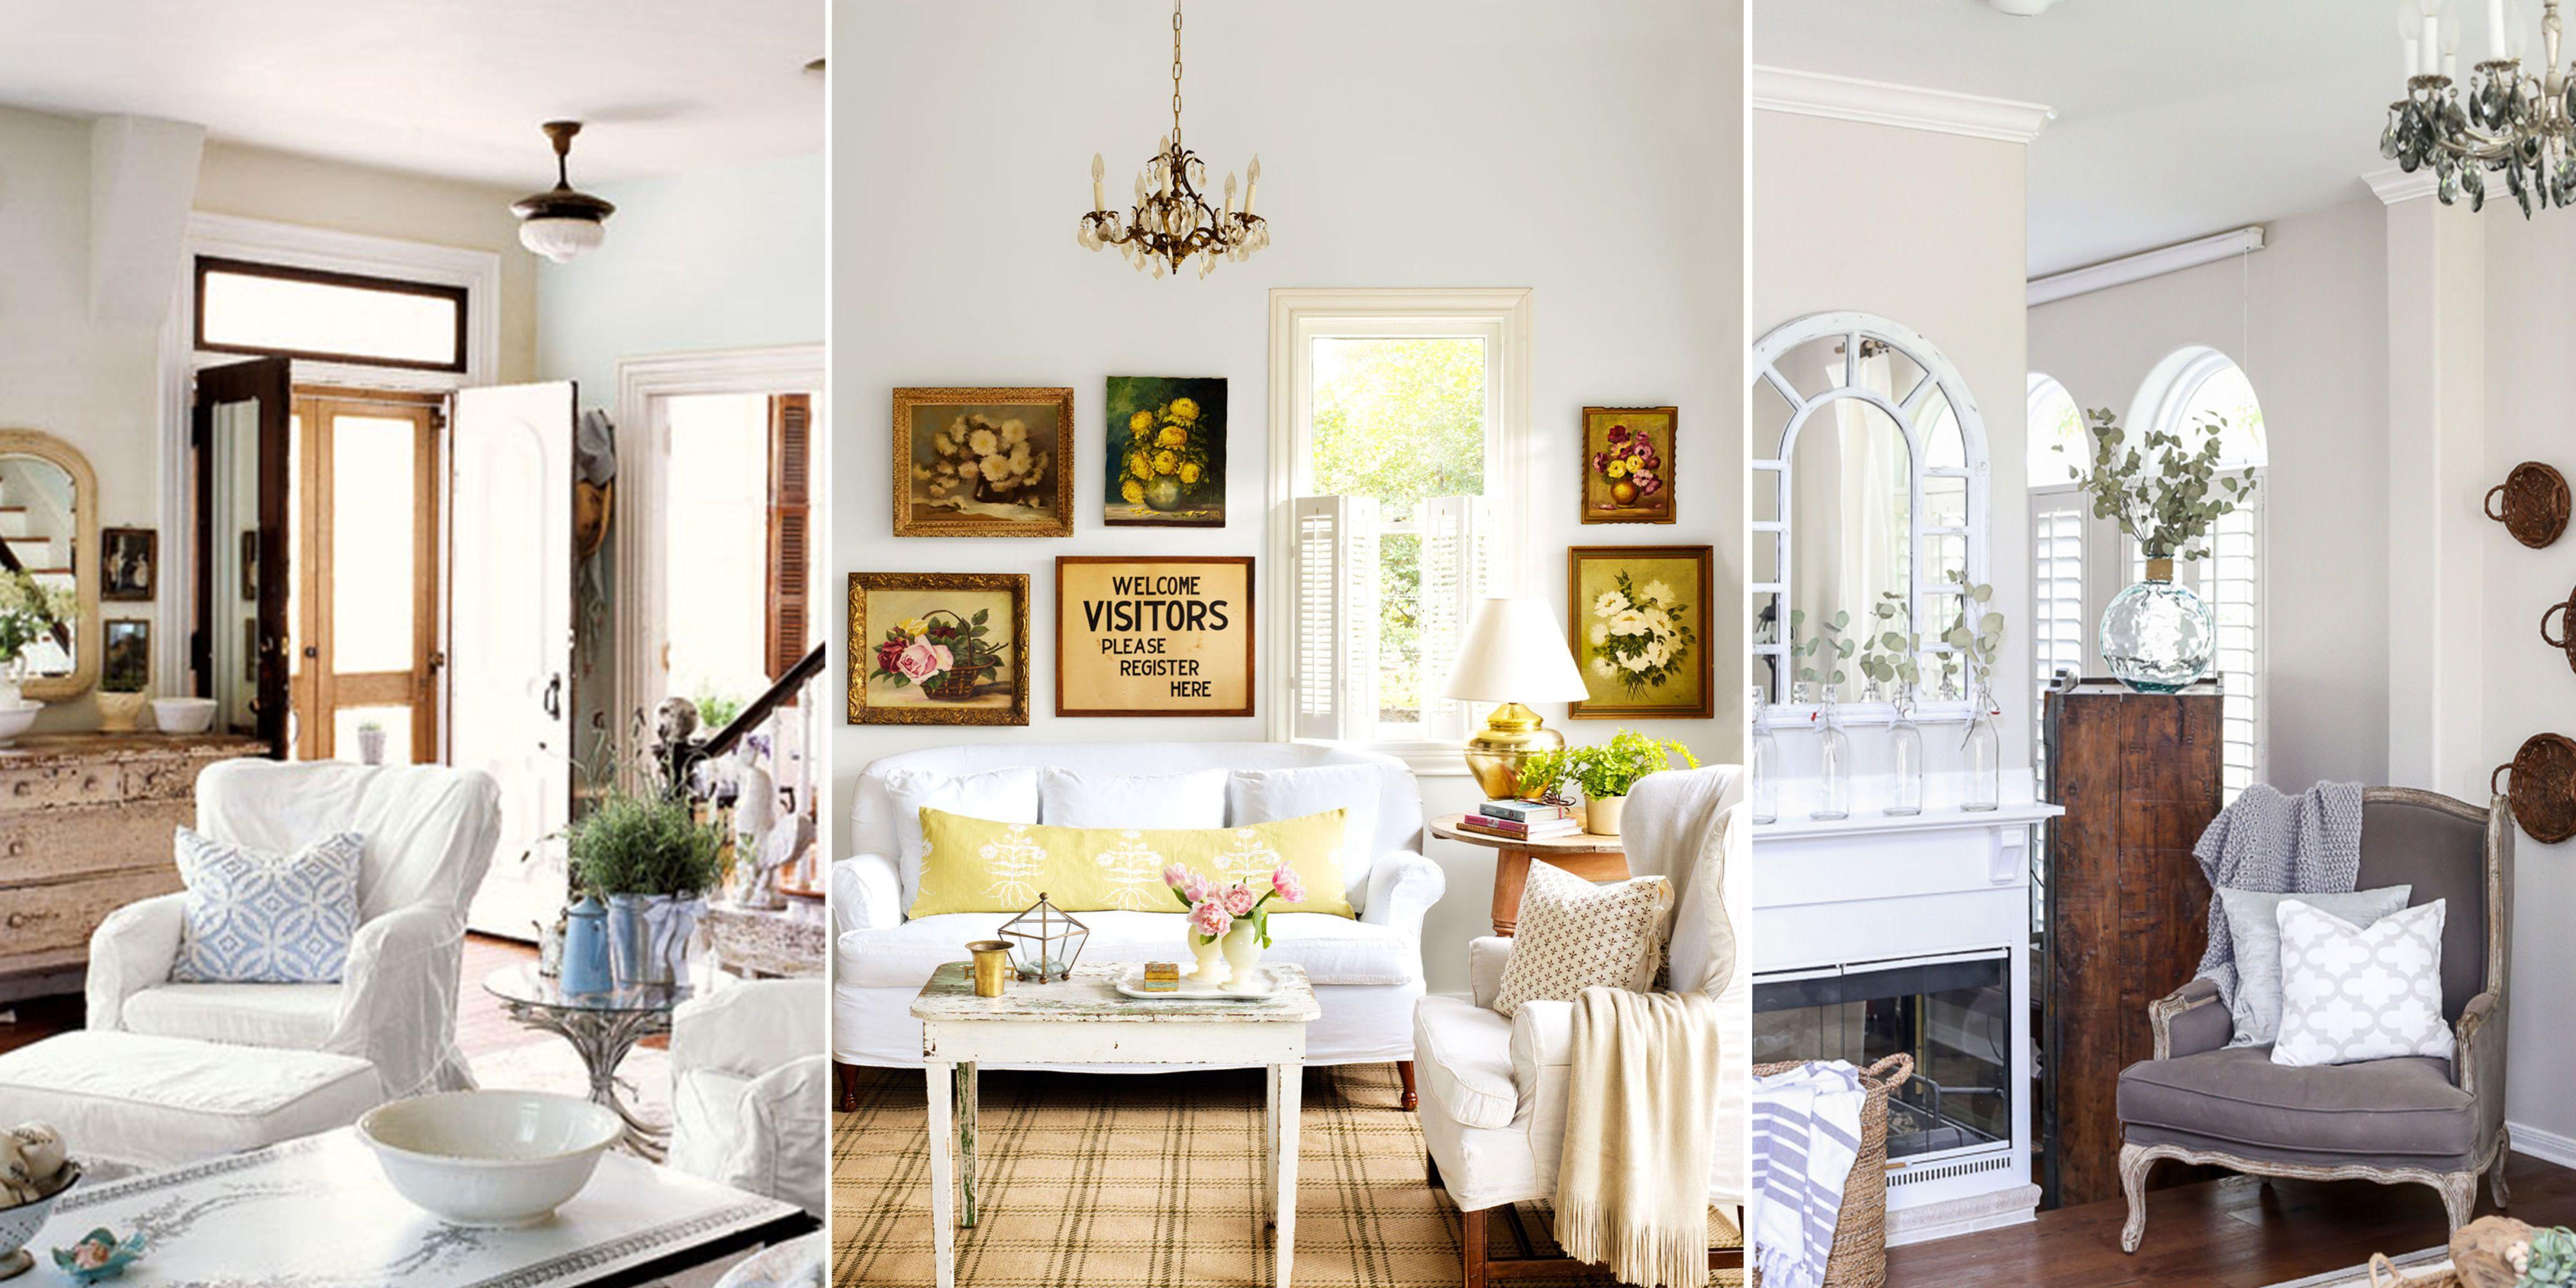 10 ShabbyChic Living Room Ideas Shabby Chic Decorating